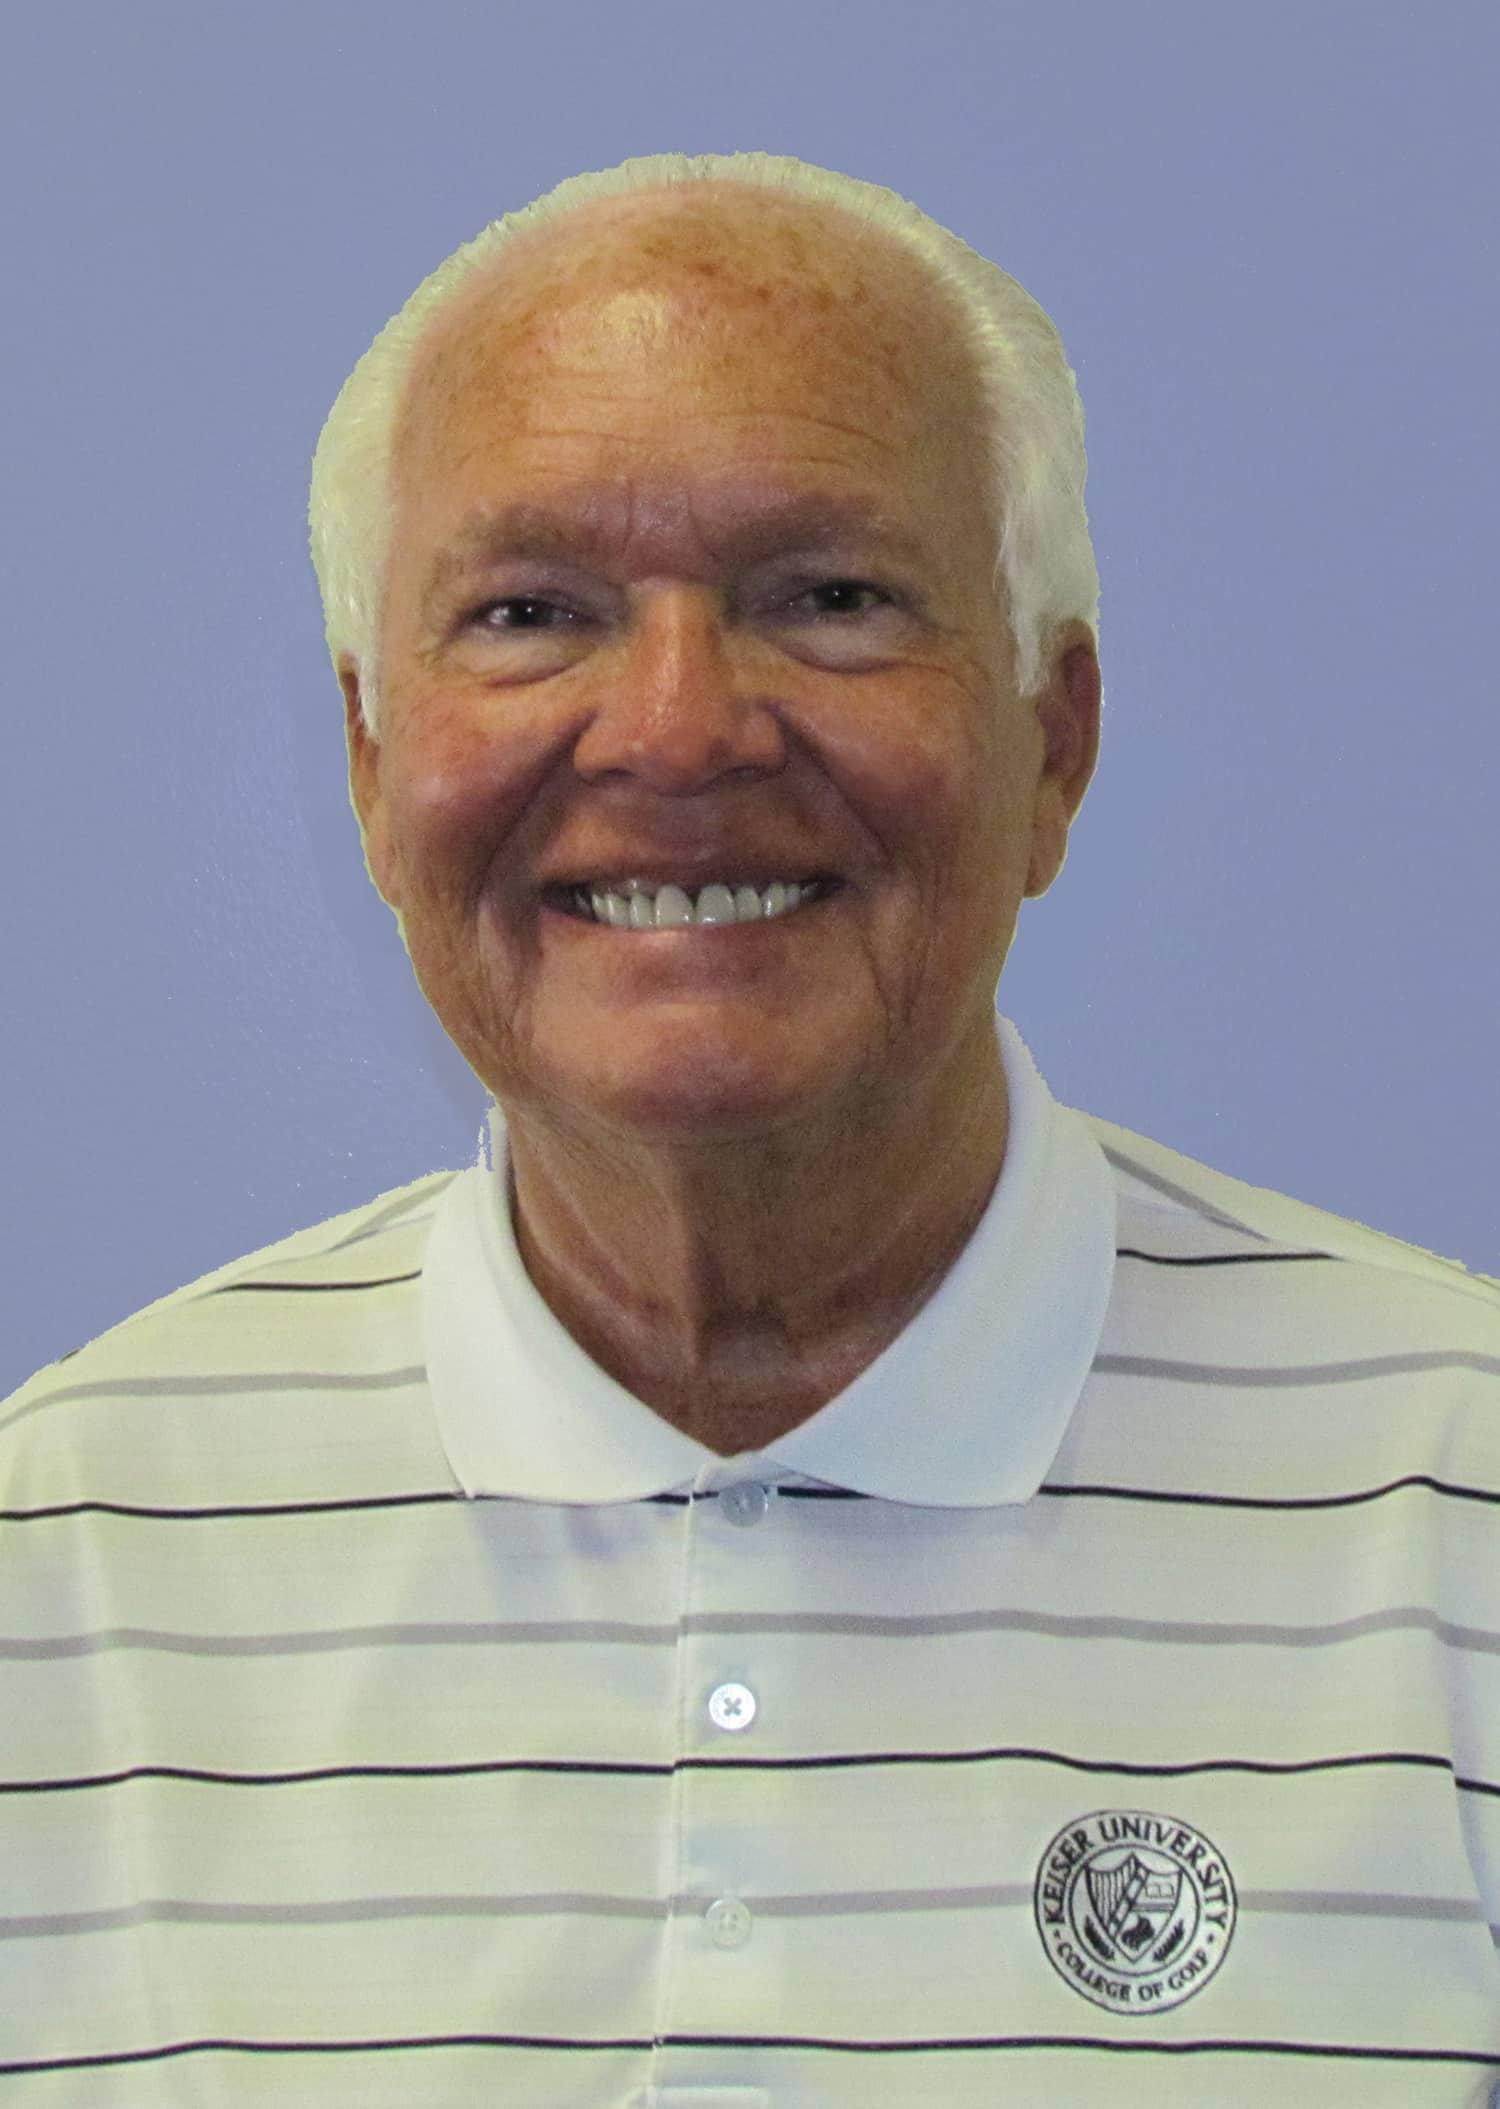 College of Golf & Sport Management Executive Director Attends Golf Magazine Top 100 Teachers Summit